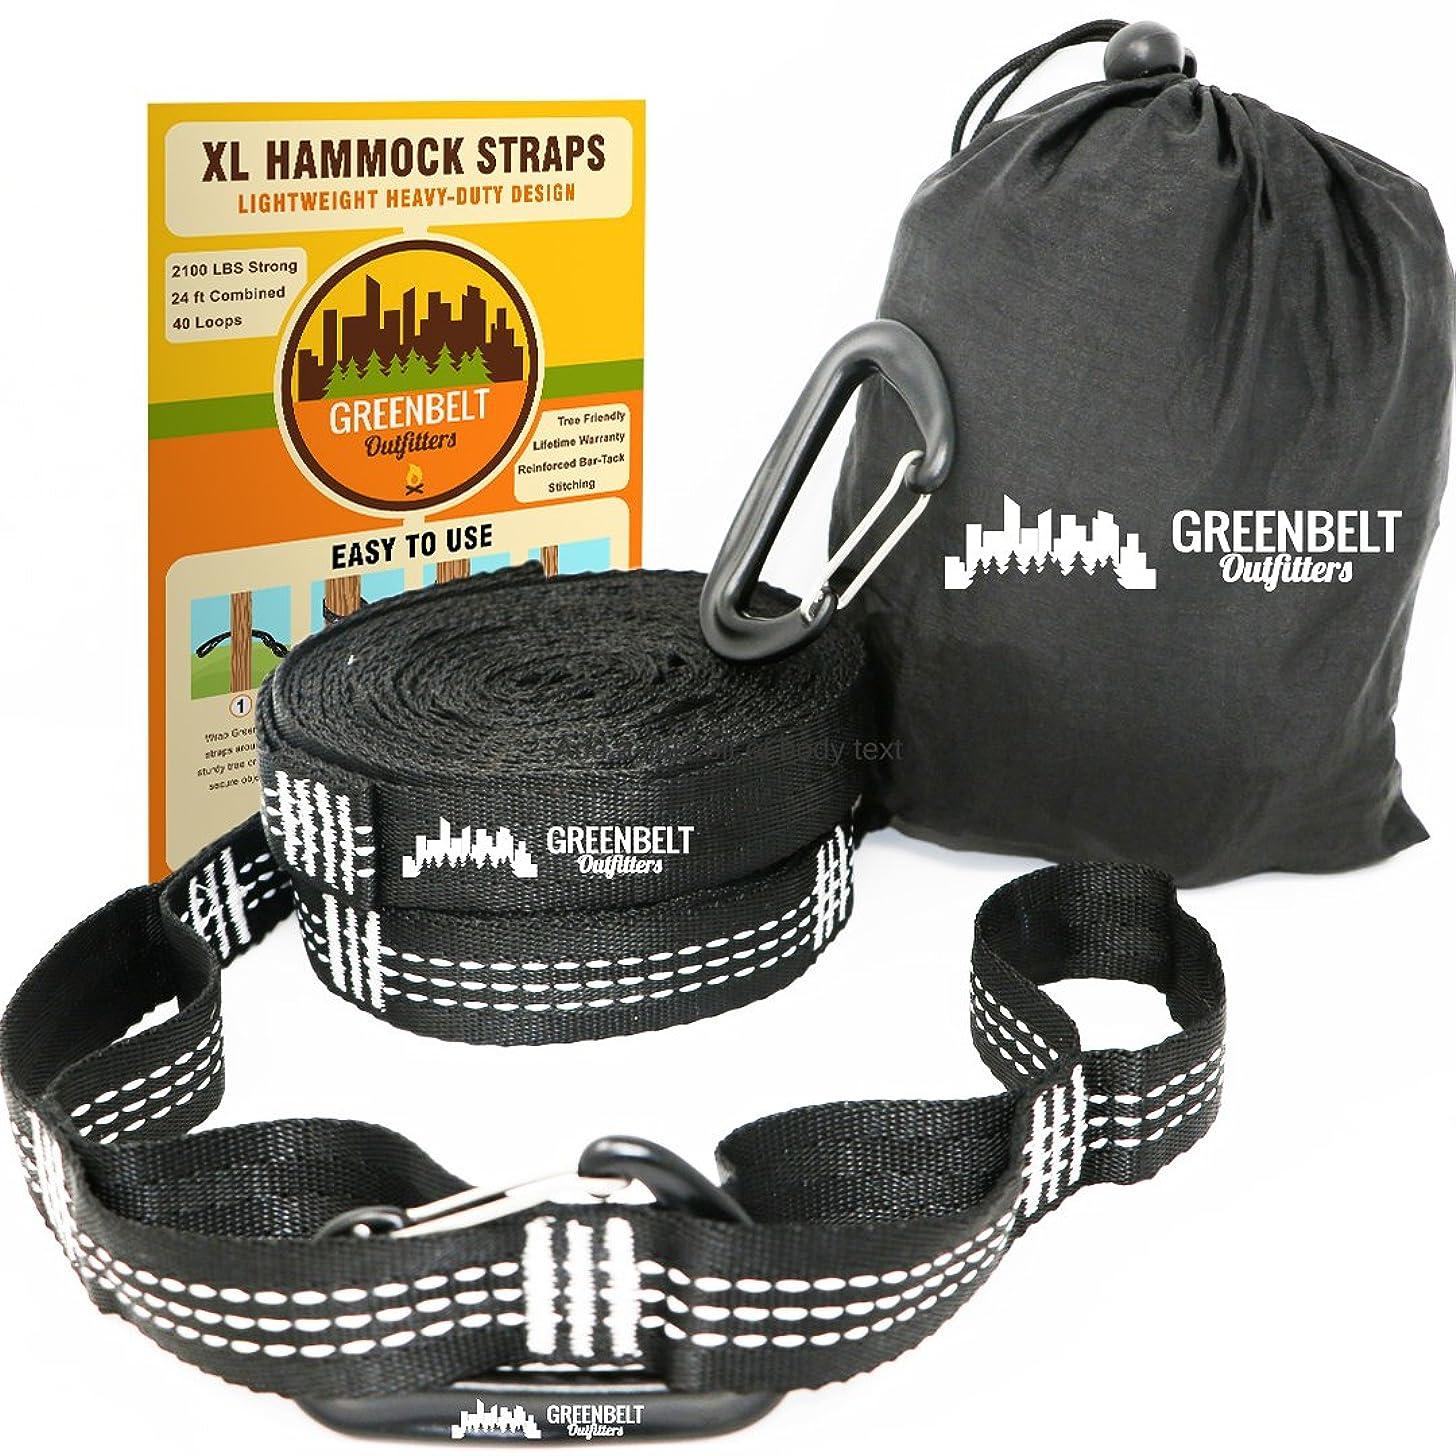 Hammock Straps XL | Hammock Tree Straps 24 ft Lightweight | Reinforced 2100+ LBS Heavy-Duty | Bonus 2 Snag Proof Aluminum Wire Gate Carabiners | 40 Loops of 100% No Stretch Camping Hammock Accessories